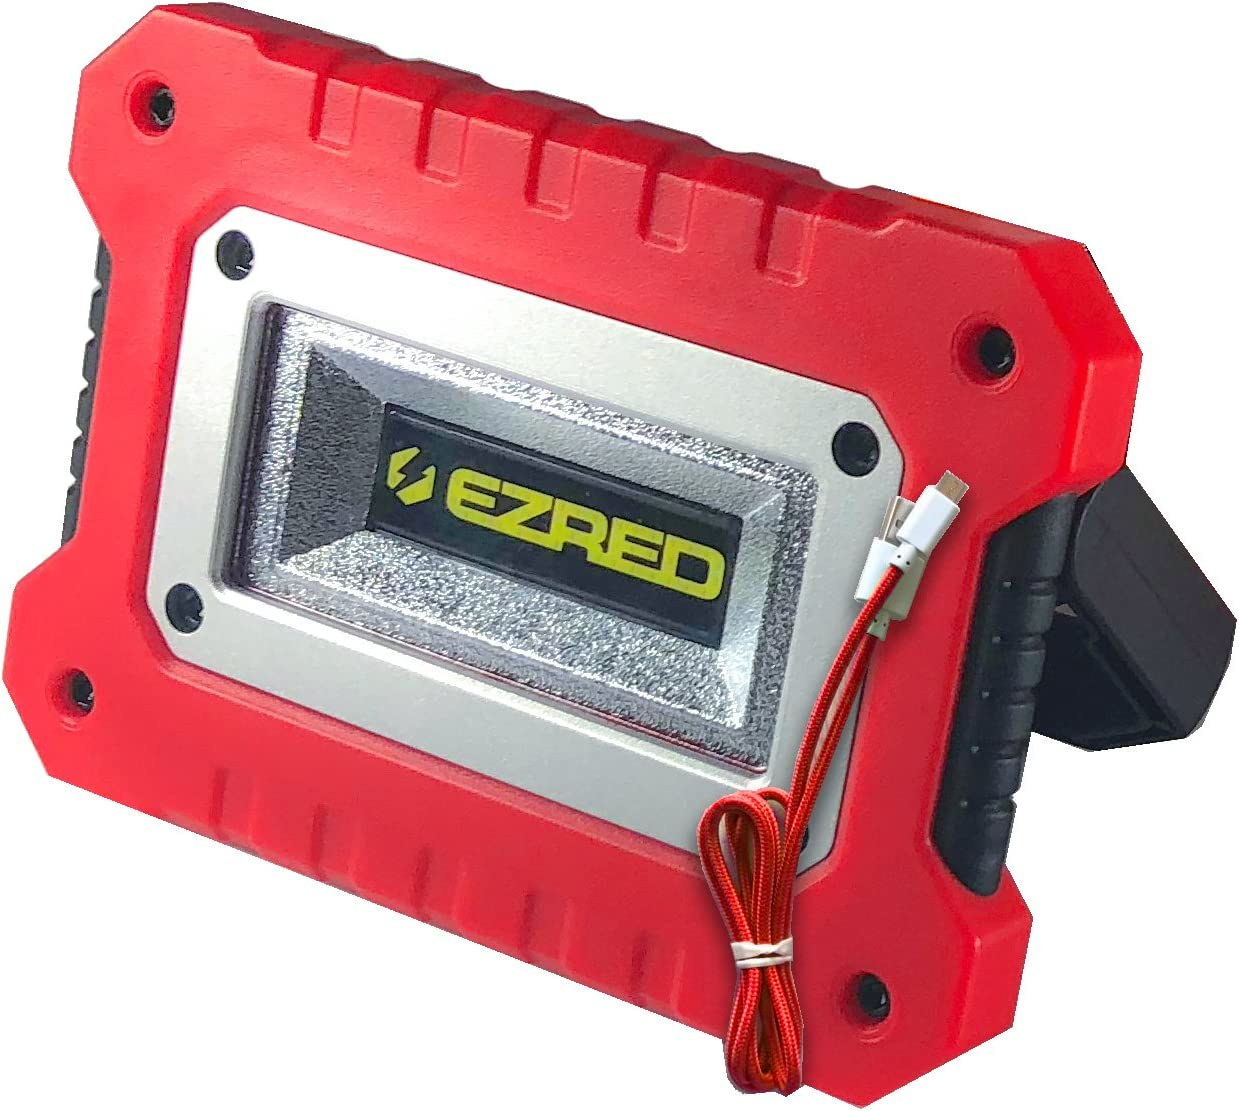 EZ Red XLM500-GR 500 Lumen Rechargeable Magnetic Work Light GREEN